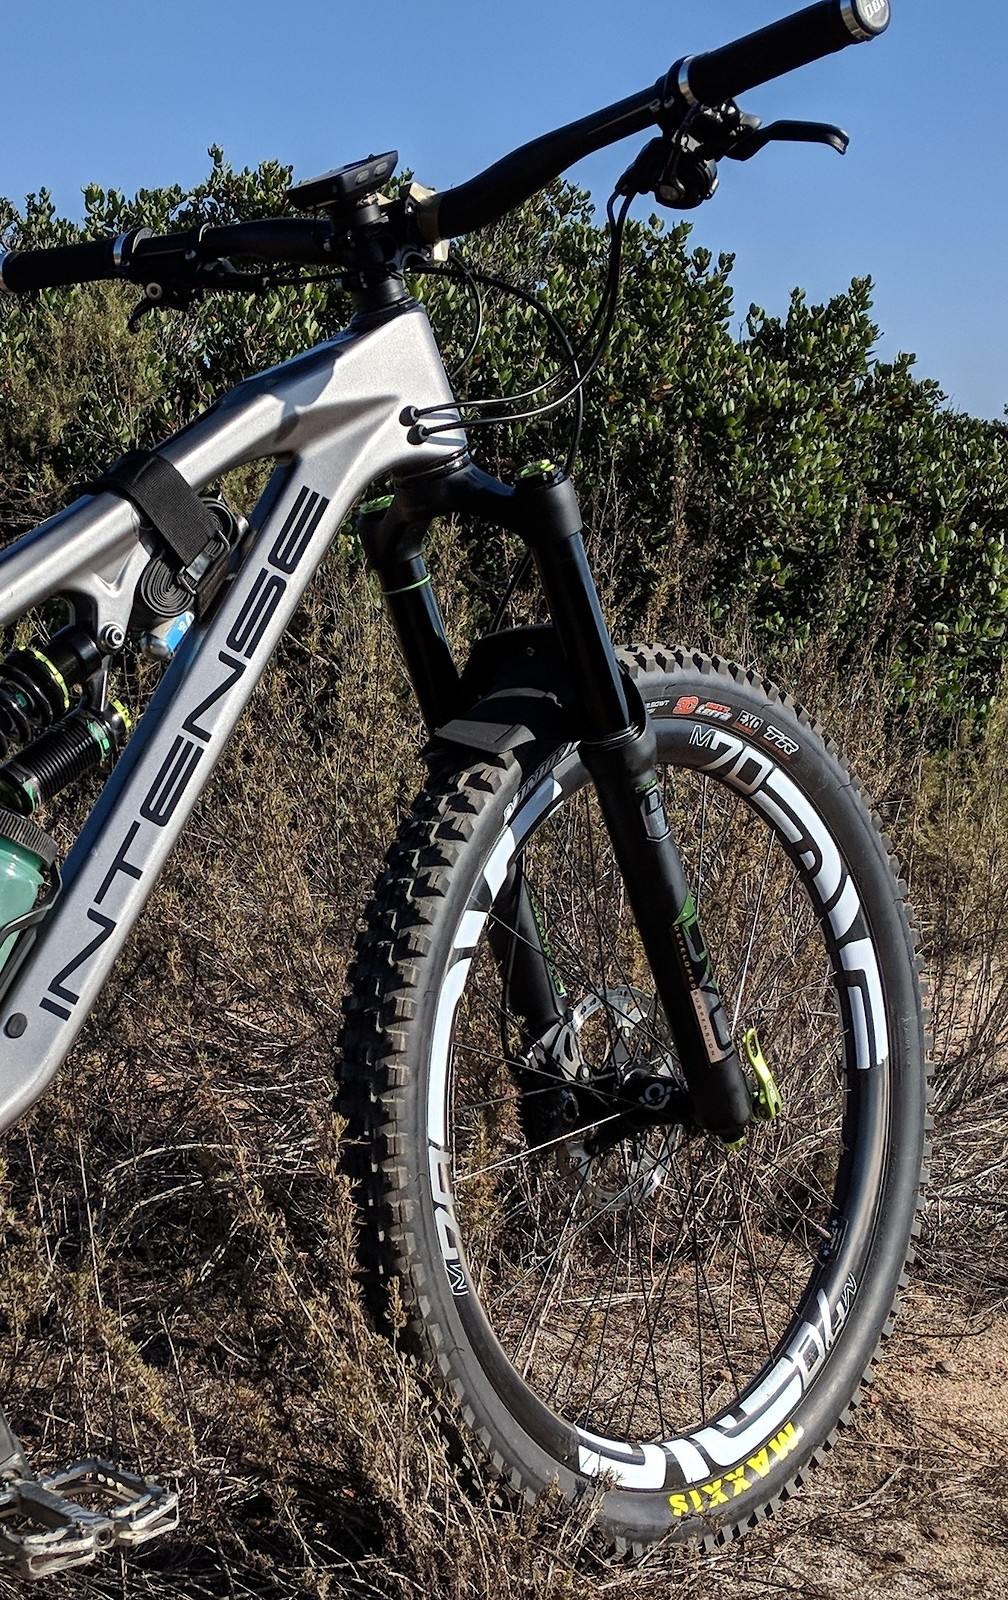 75ec9e2ed9a Intense Spider - kaymonster's Bike Check - Vital MTB